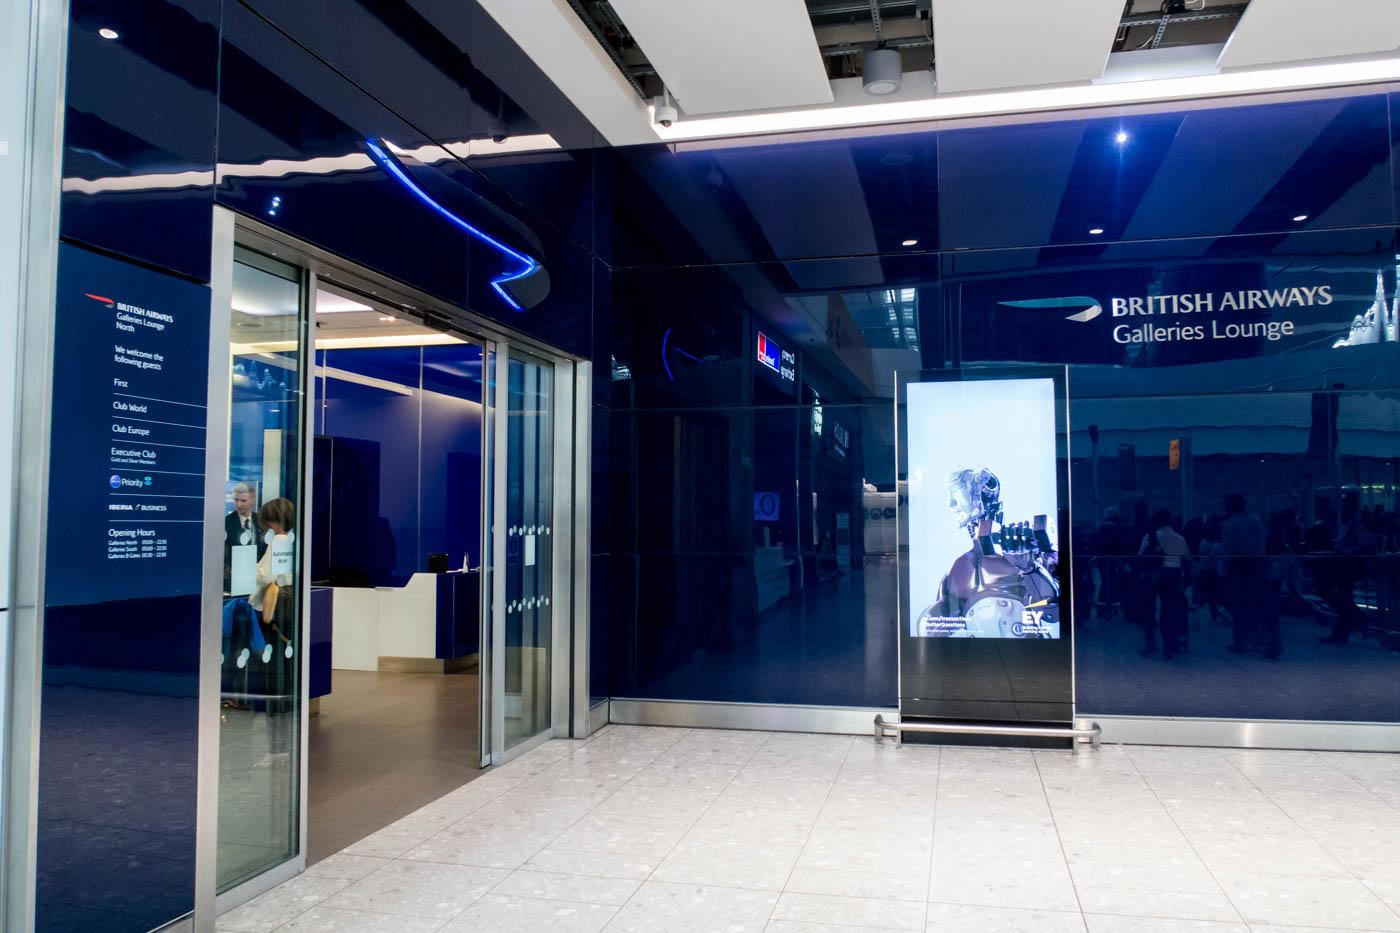 Ba Lounge Terminal 3 >> Review British Airways Galleries Lounge At London Heathrow